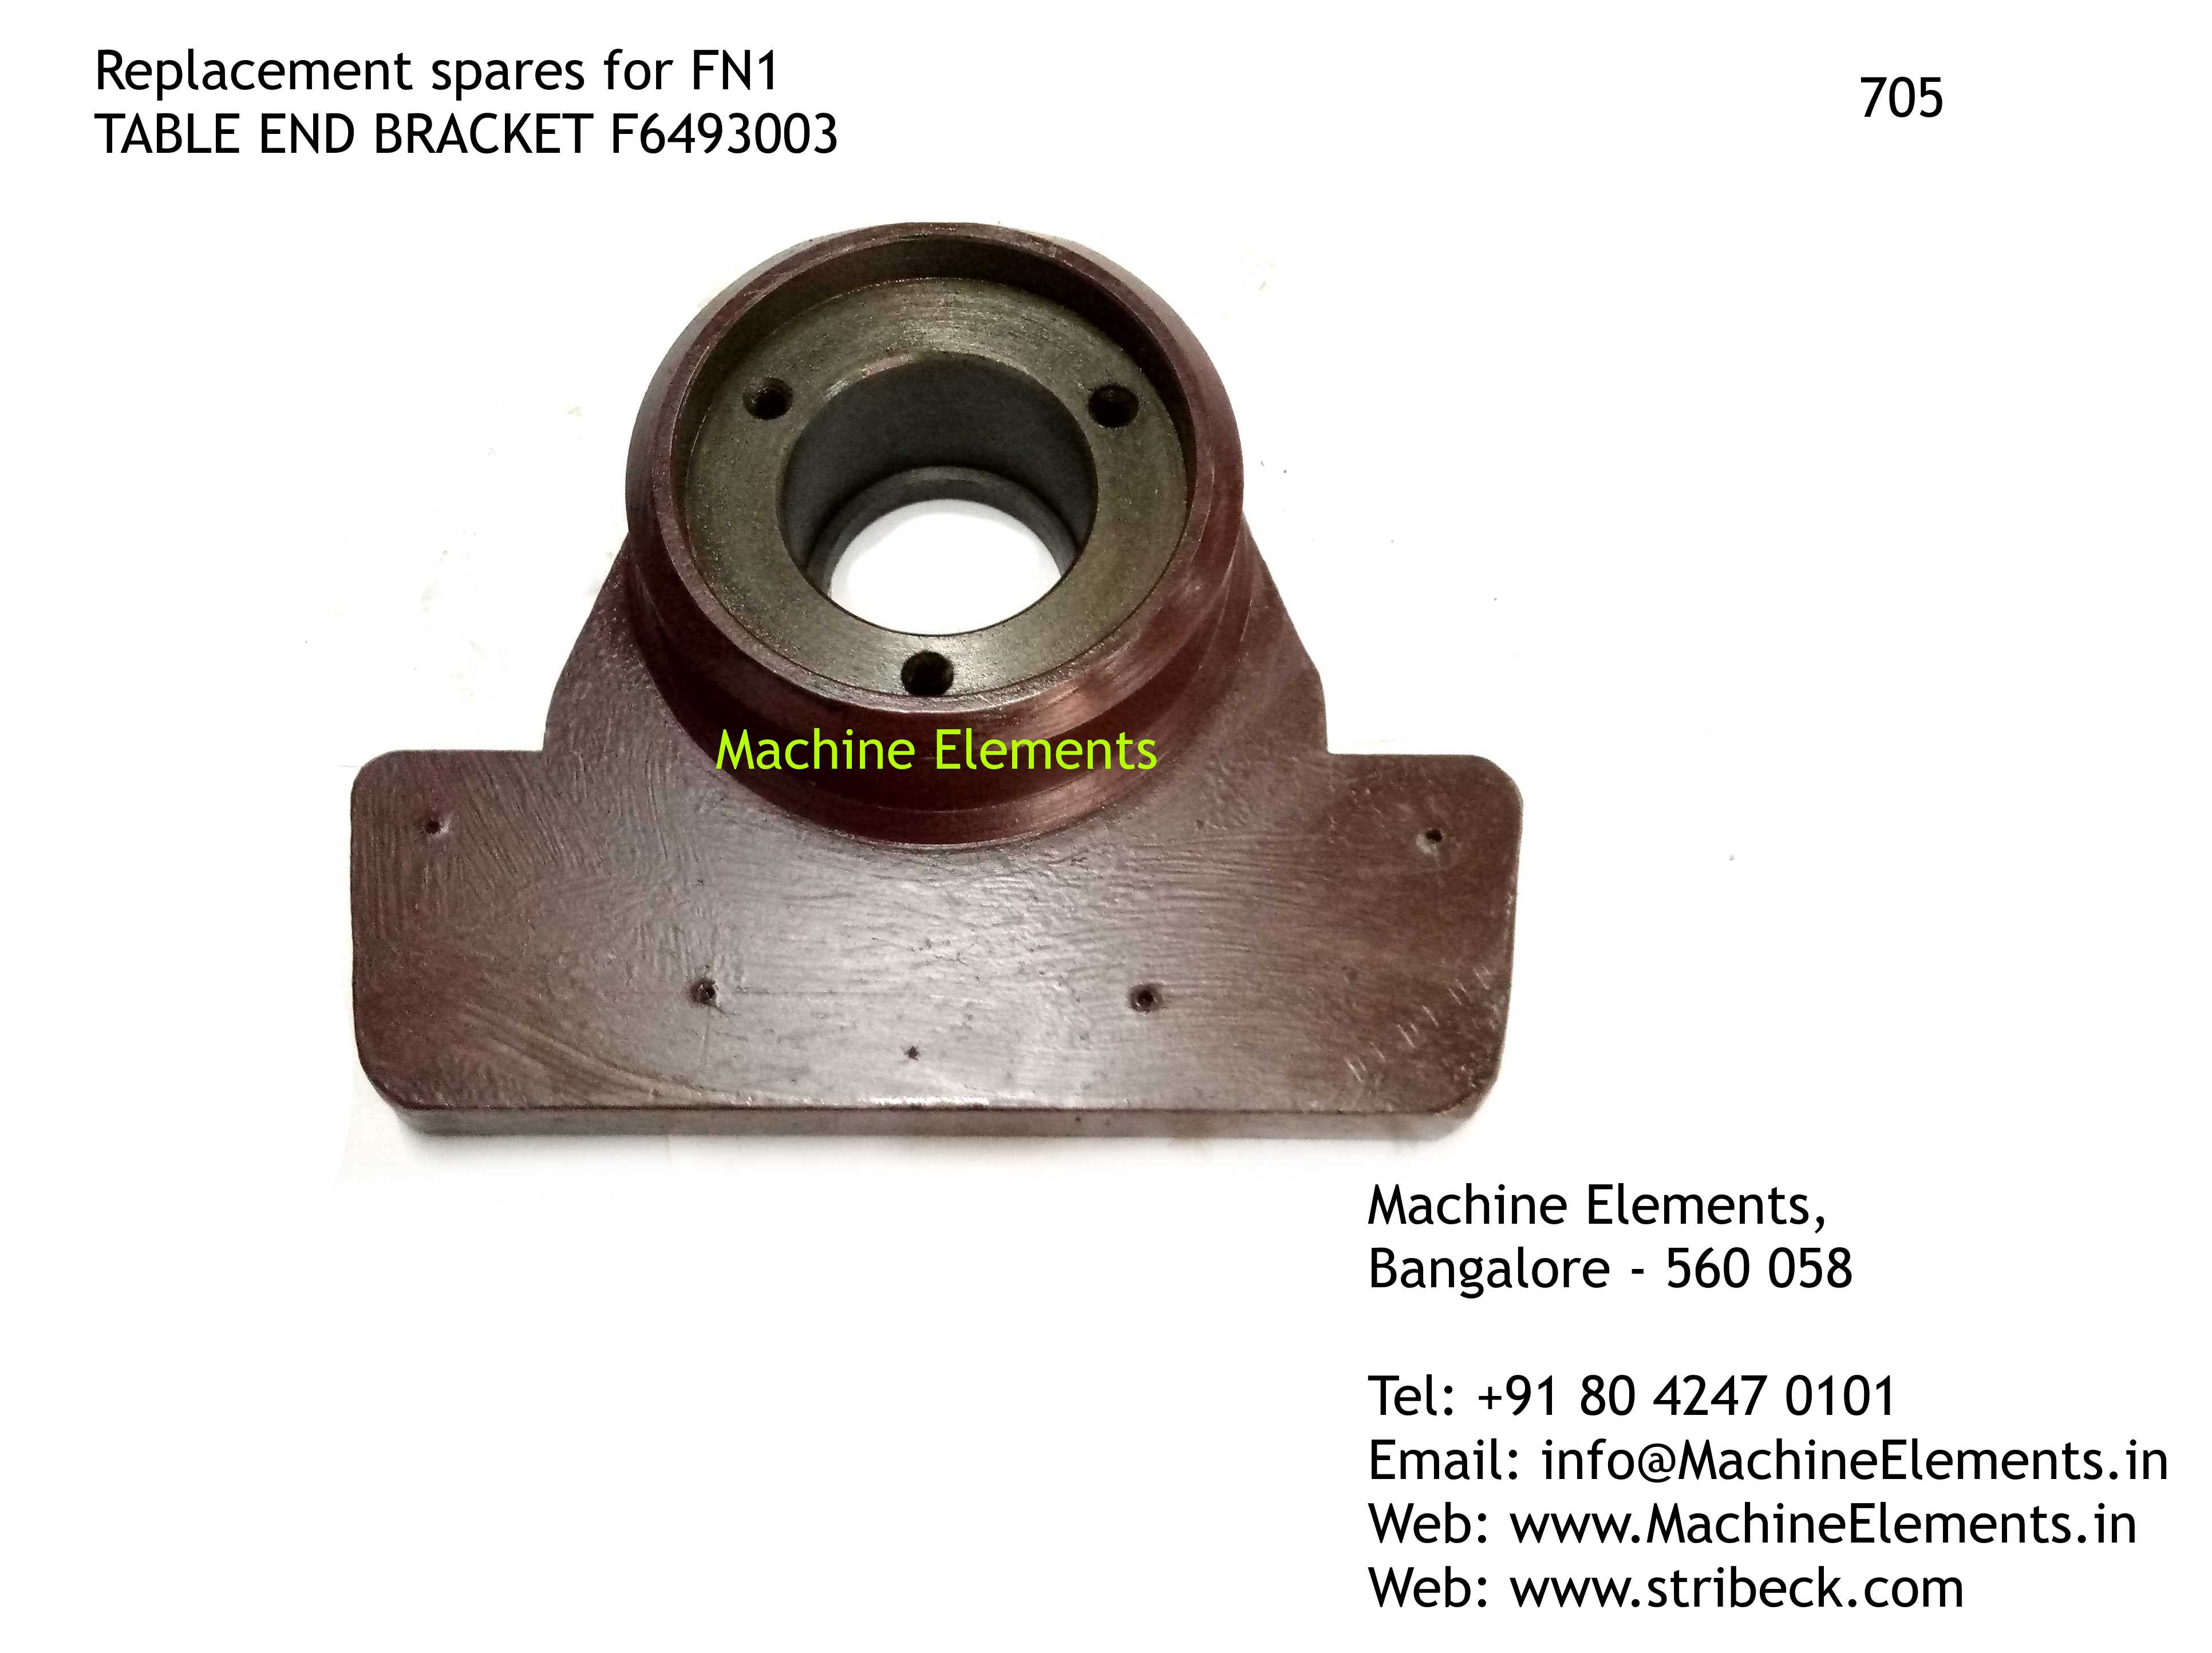 TABLE END BRACKET, F6493003